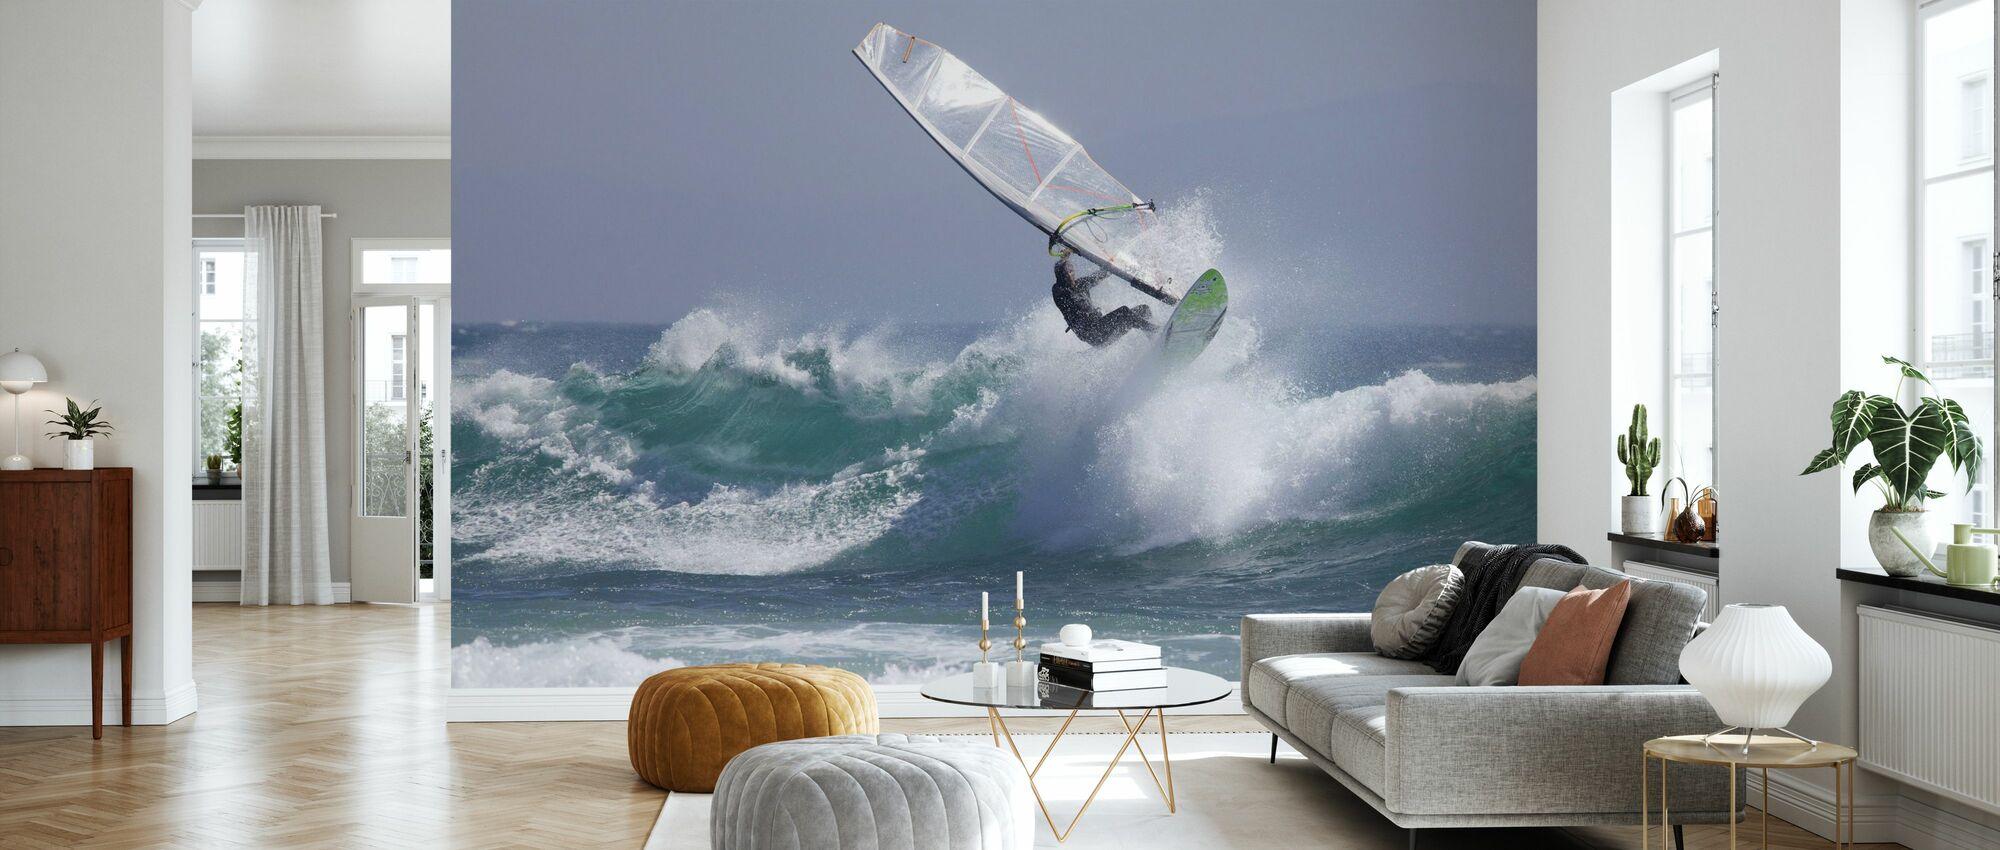 Windsurfing - Wallpaper - Living Room